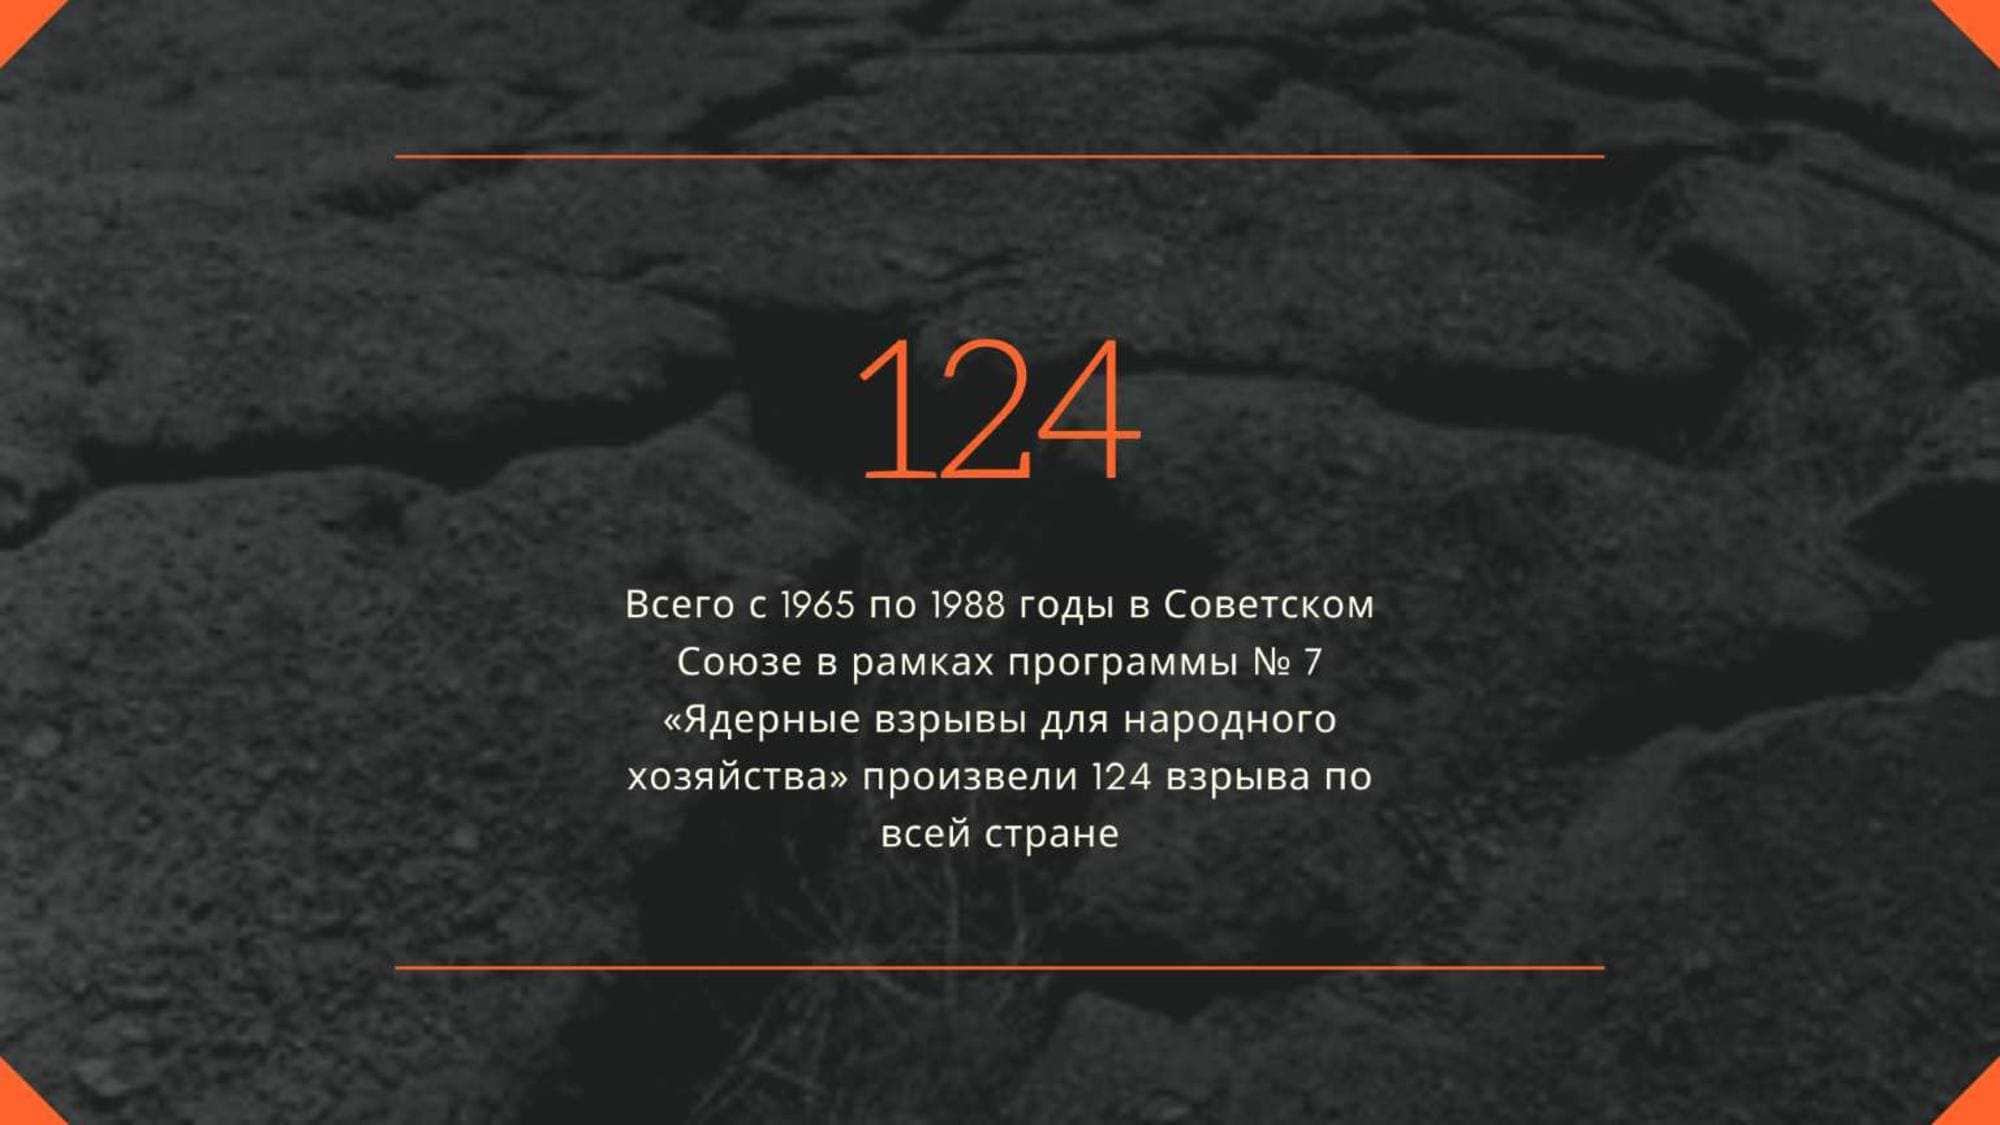 124 взрыва по всей стране с 1965 по 1988 гг